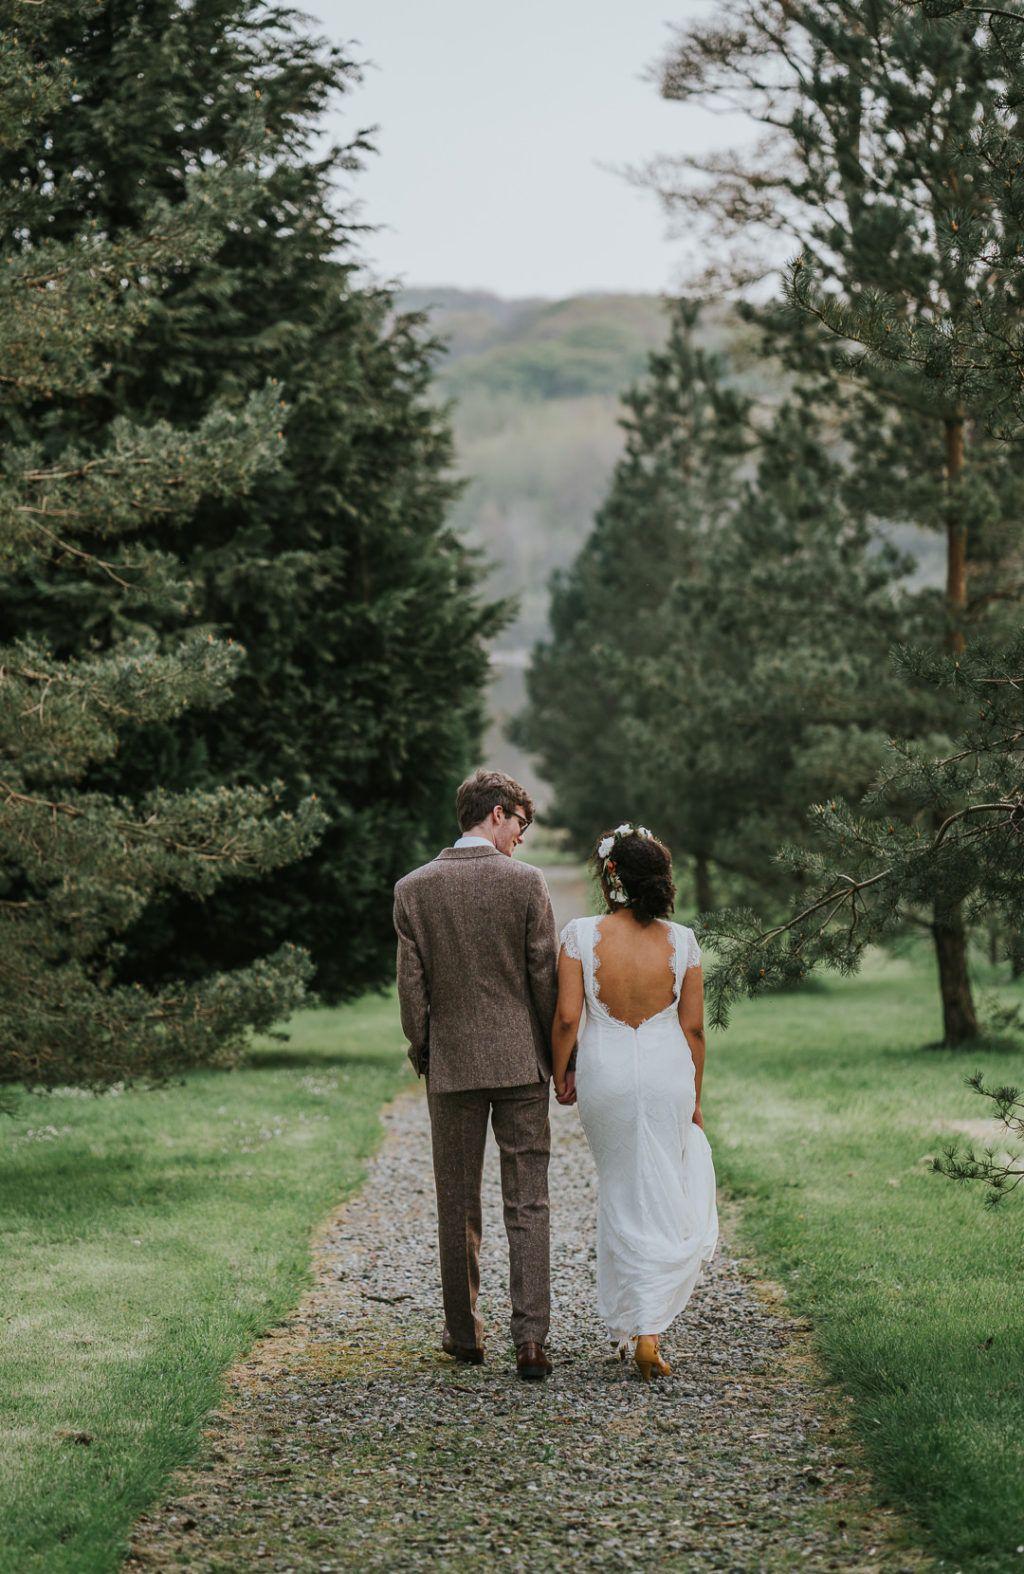 Relaxed Romance At Lissanoure Castle Kate Calvin Onefabday Com Ireland In 2020 Castle Wedding Wedding Thanks Boho Style Wedding Dress